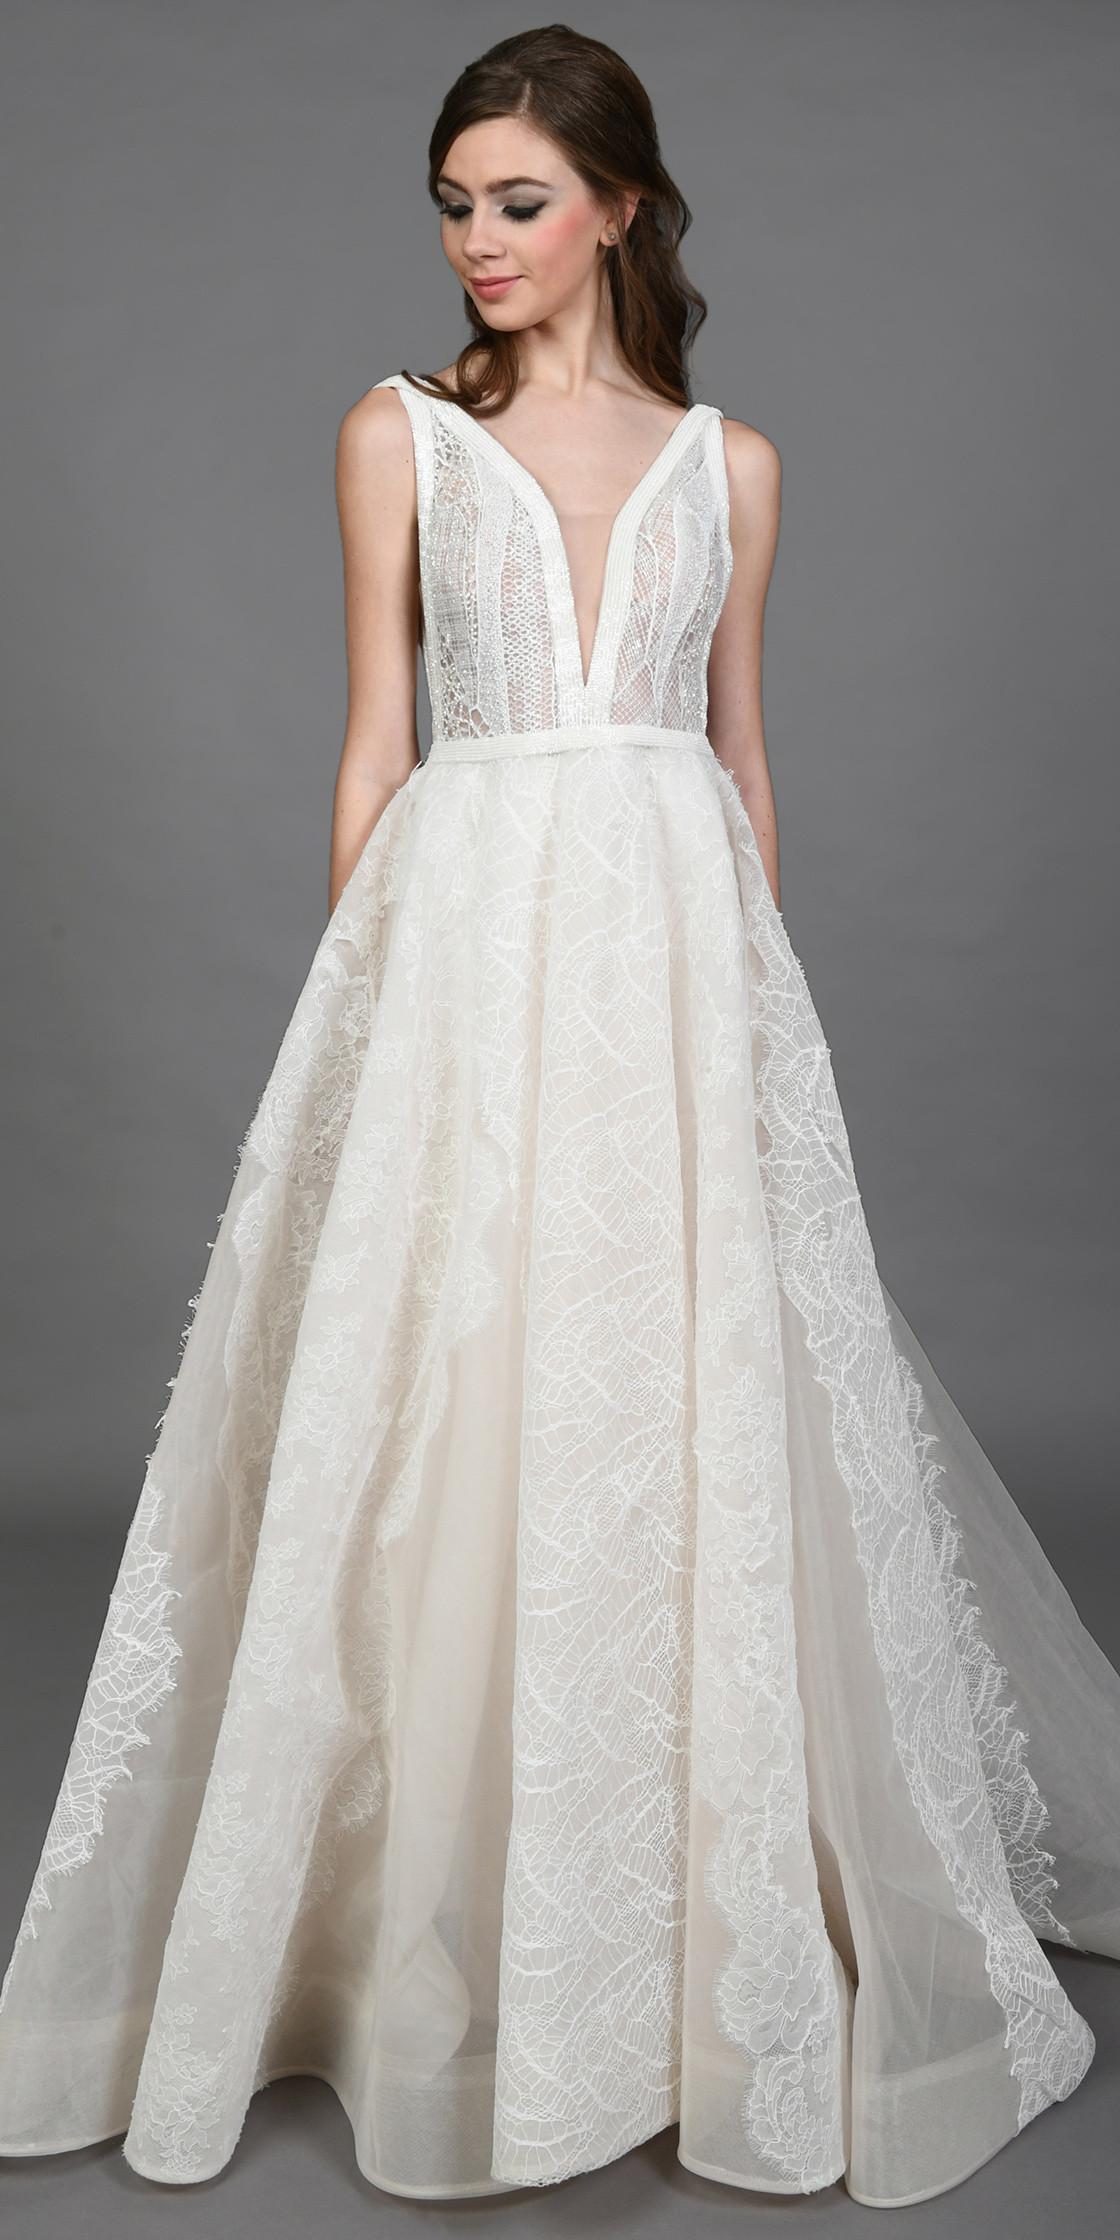 Esposa Couture Sleeveless Beaded Gown Wedding Dress Rental